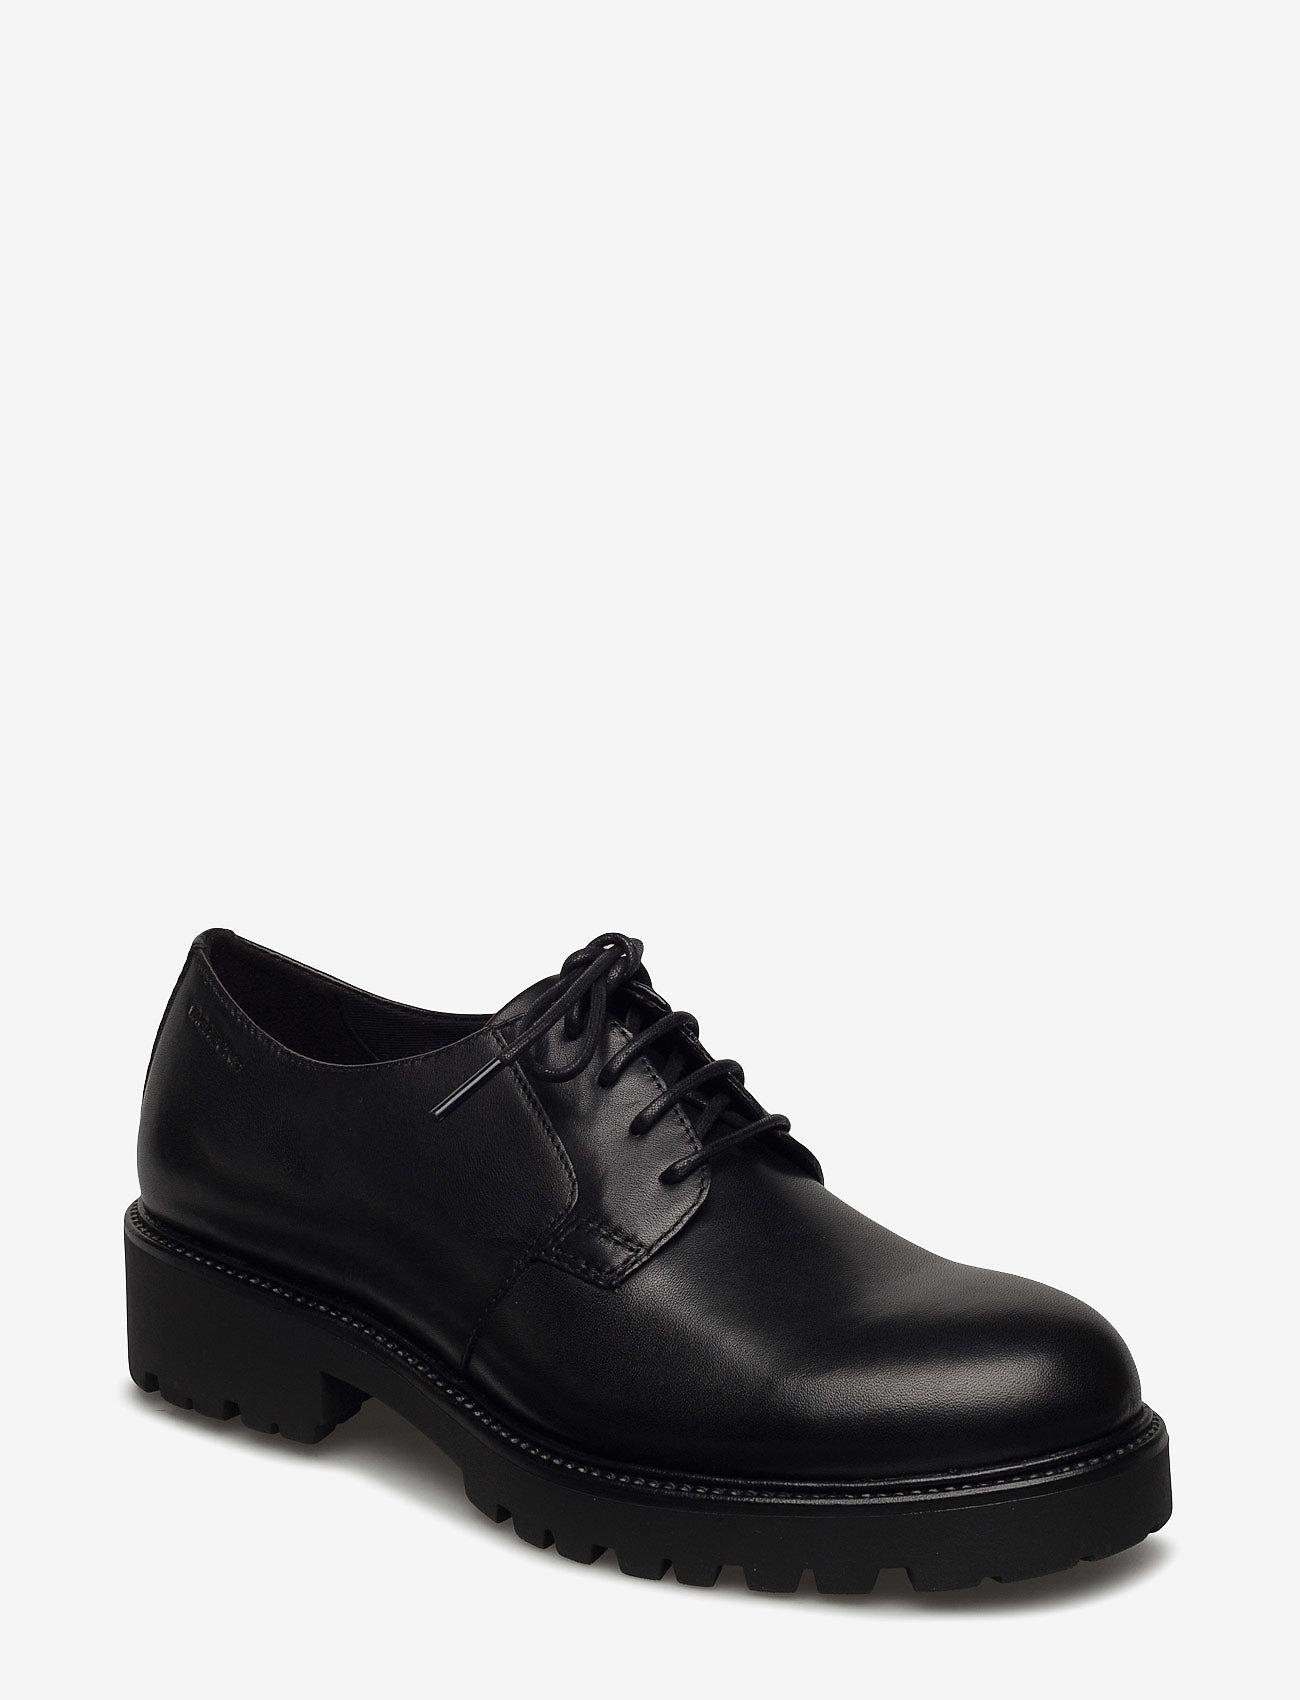 VAGABOND - KENOVA - buty sznurowane - black - 0